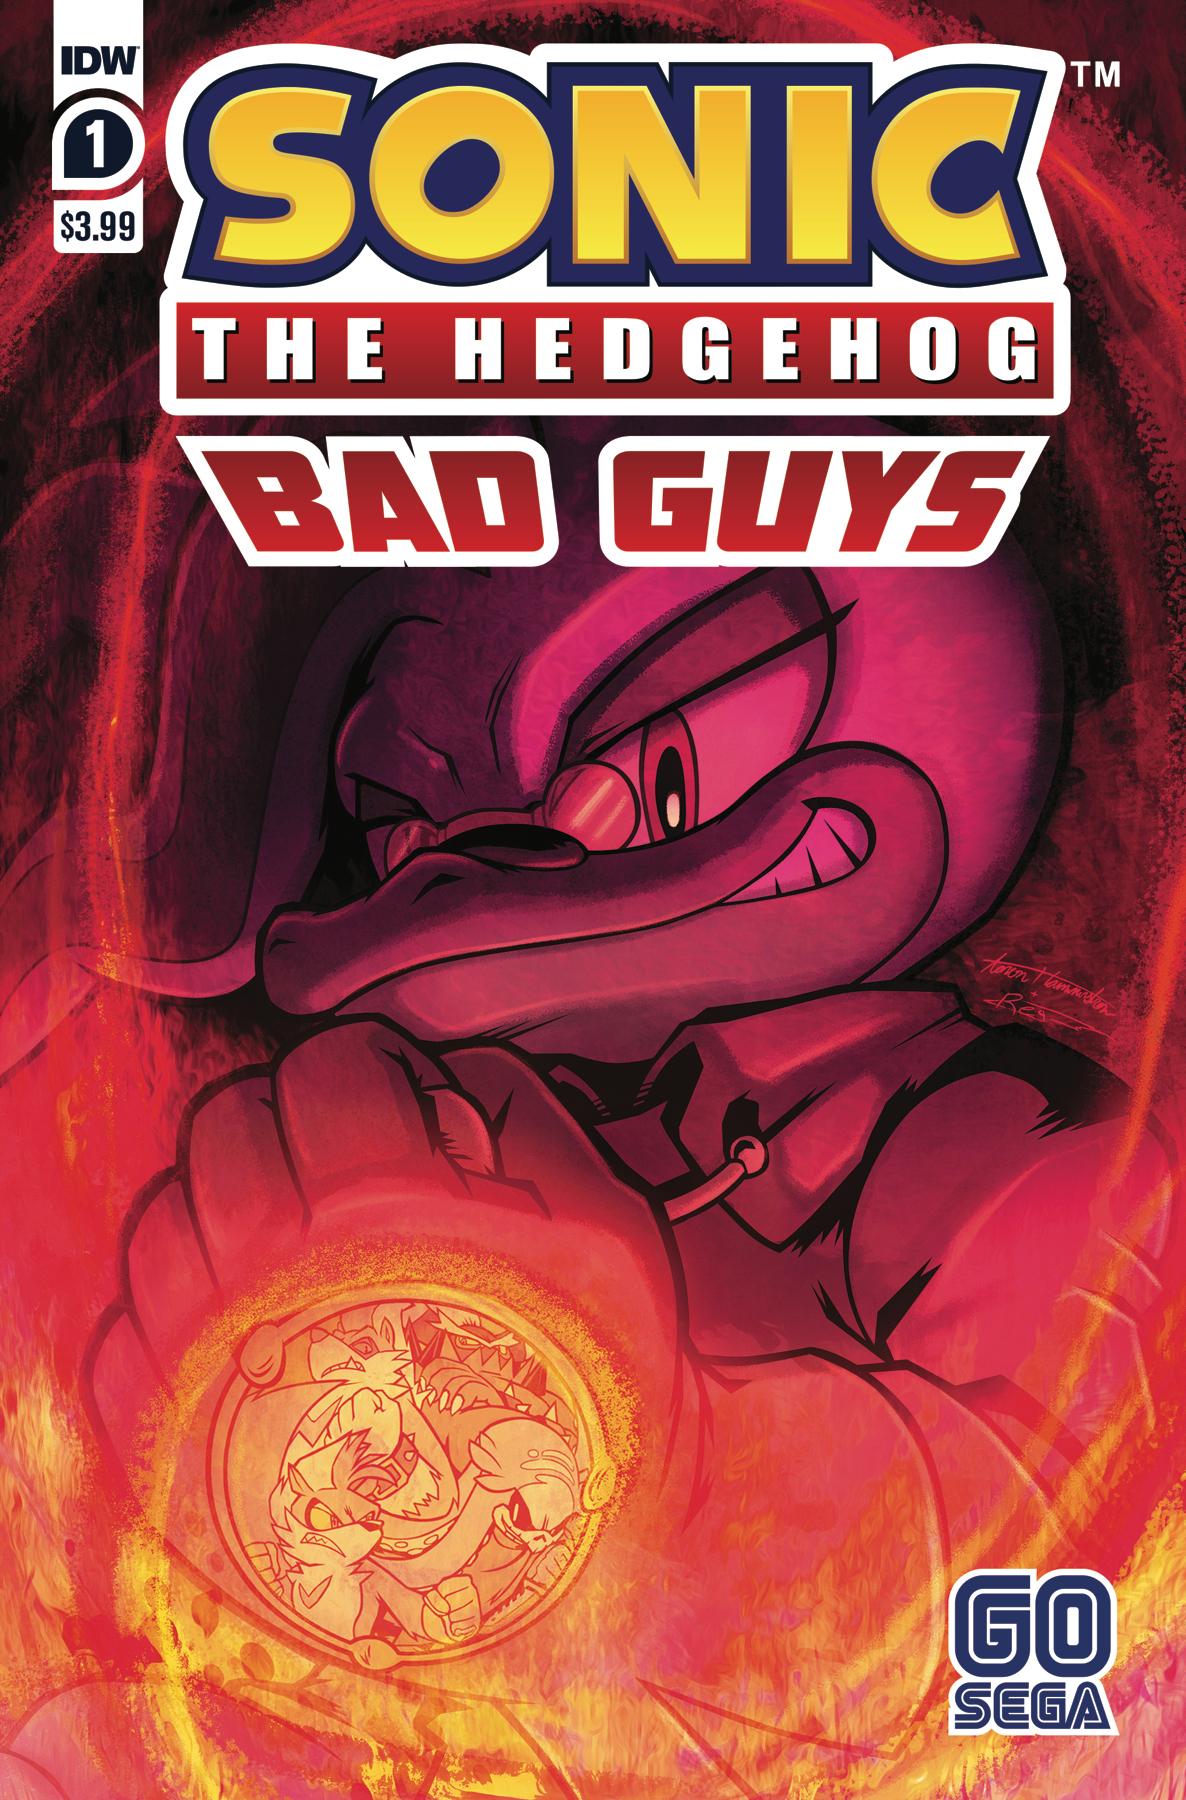 SONIC THE HEDGEHOG BAD GUYS #1 (OF 4) CVR A HAMMERSTROM